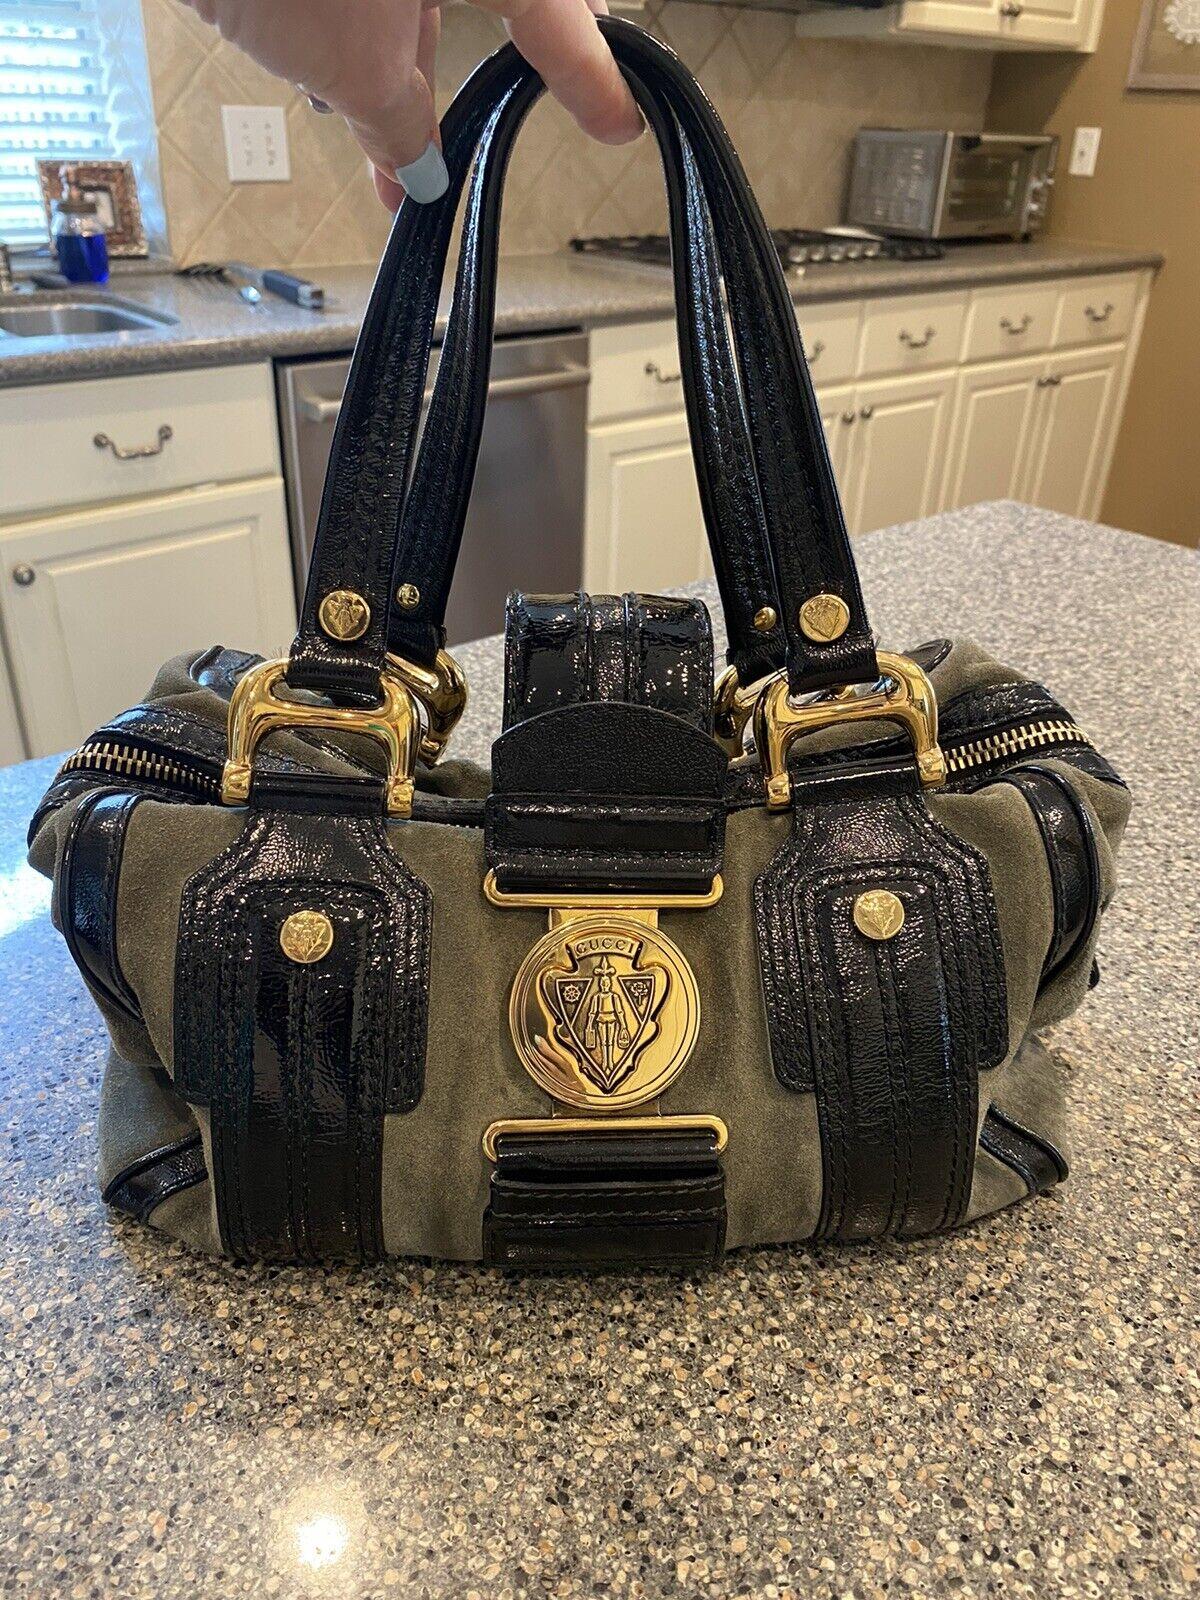 gucci handbag - image 1